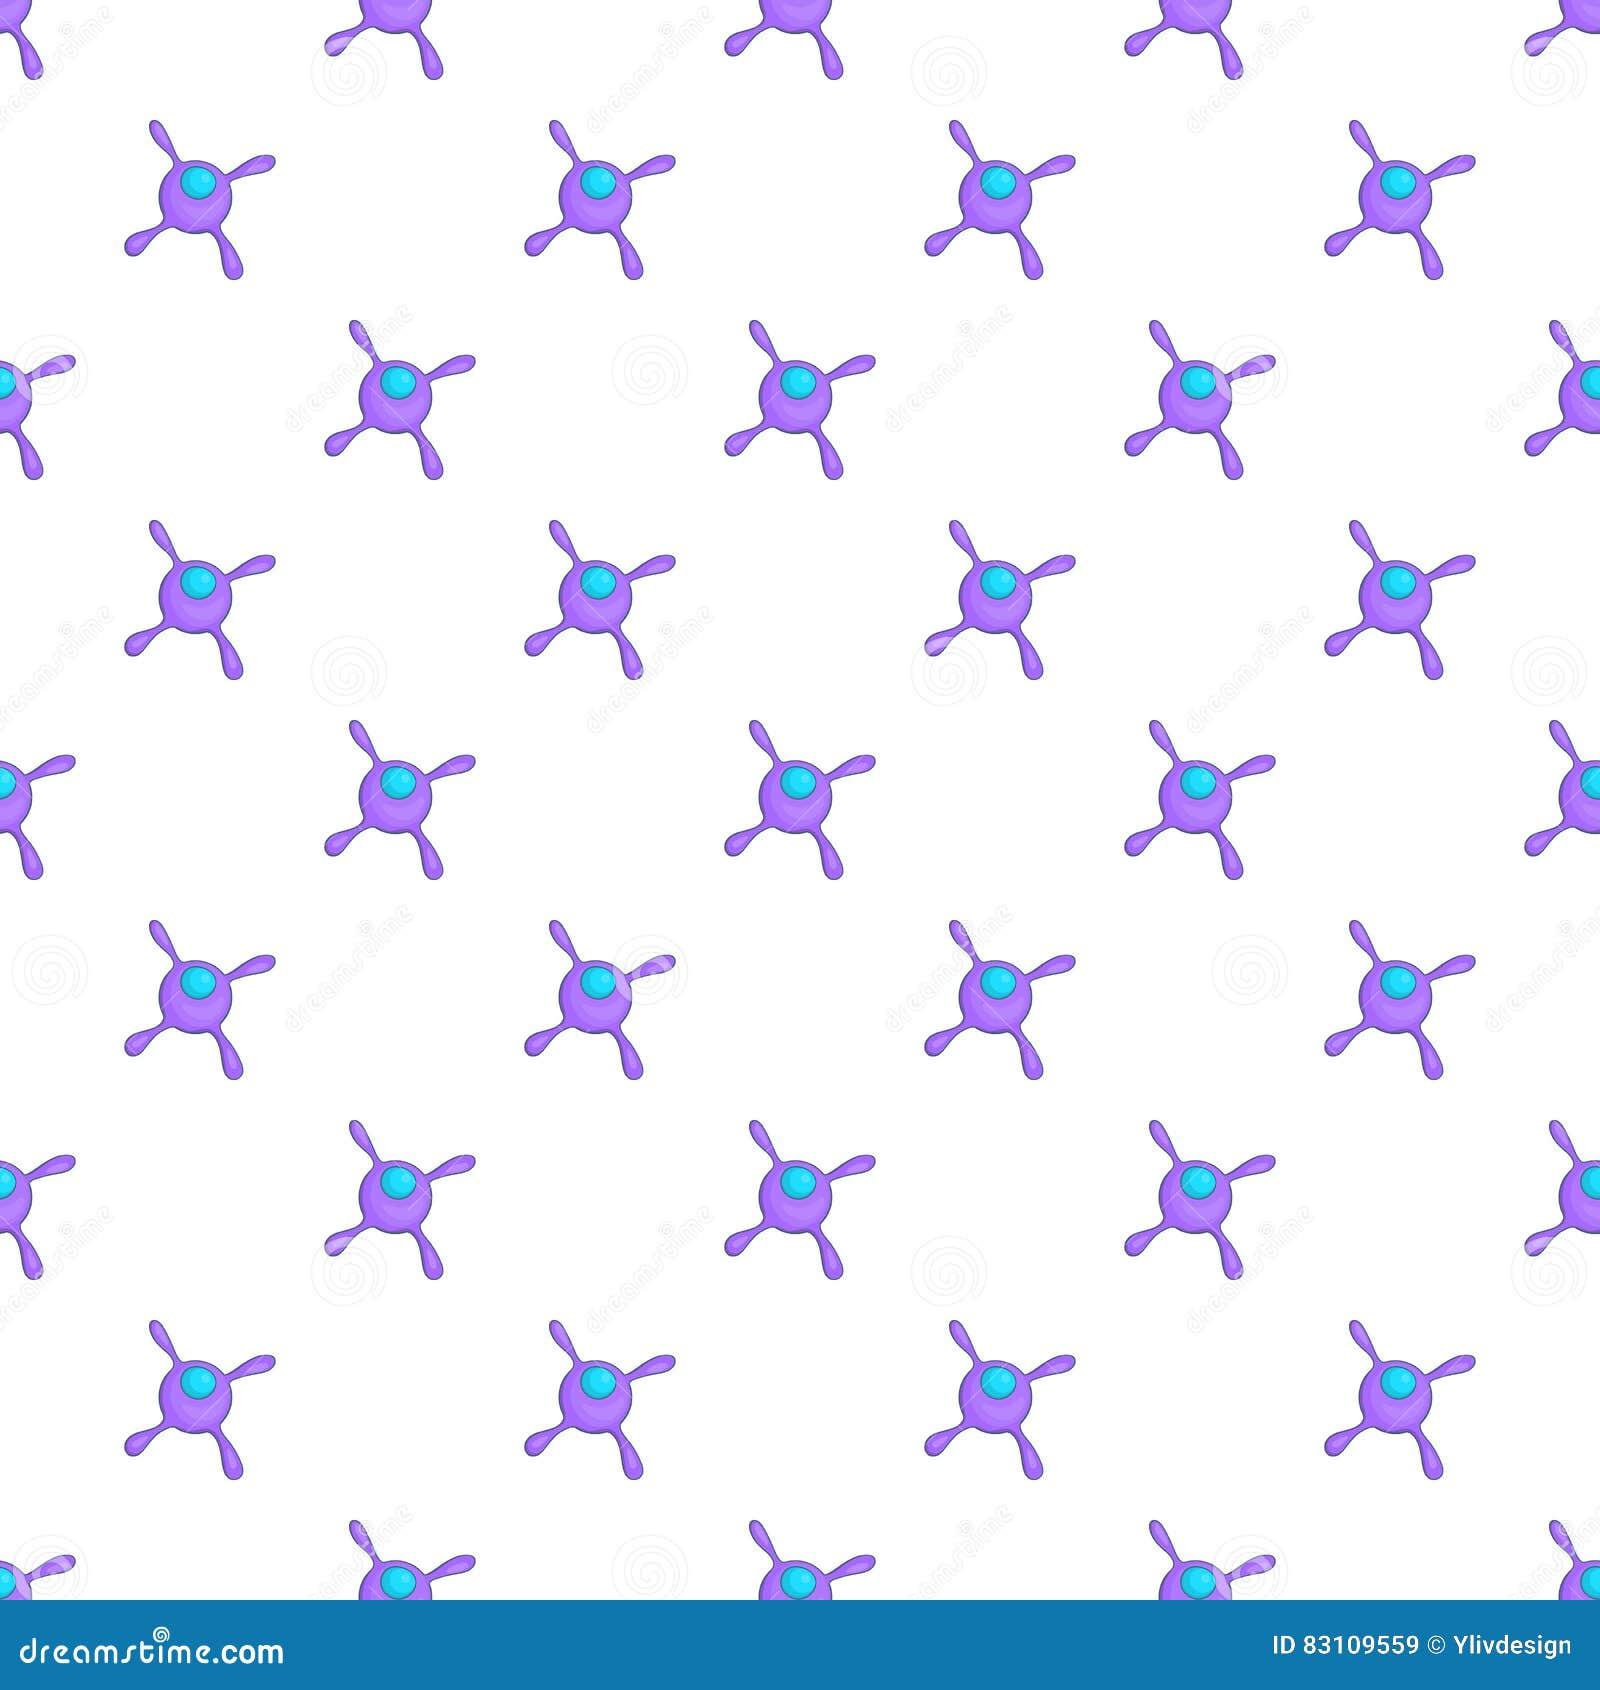 Viral Times Web: Cell Virus Pattern, Cartoon Style Stock Vector